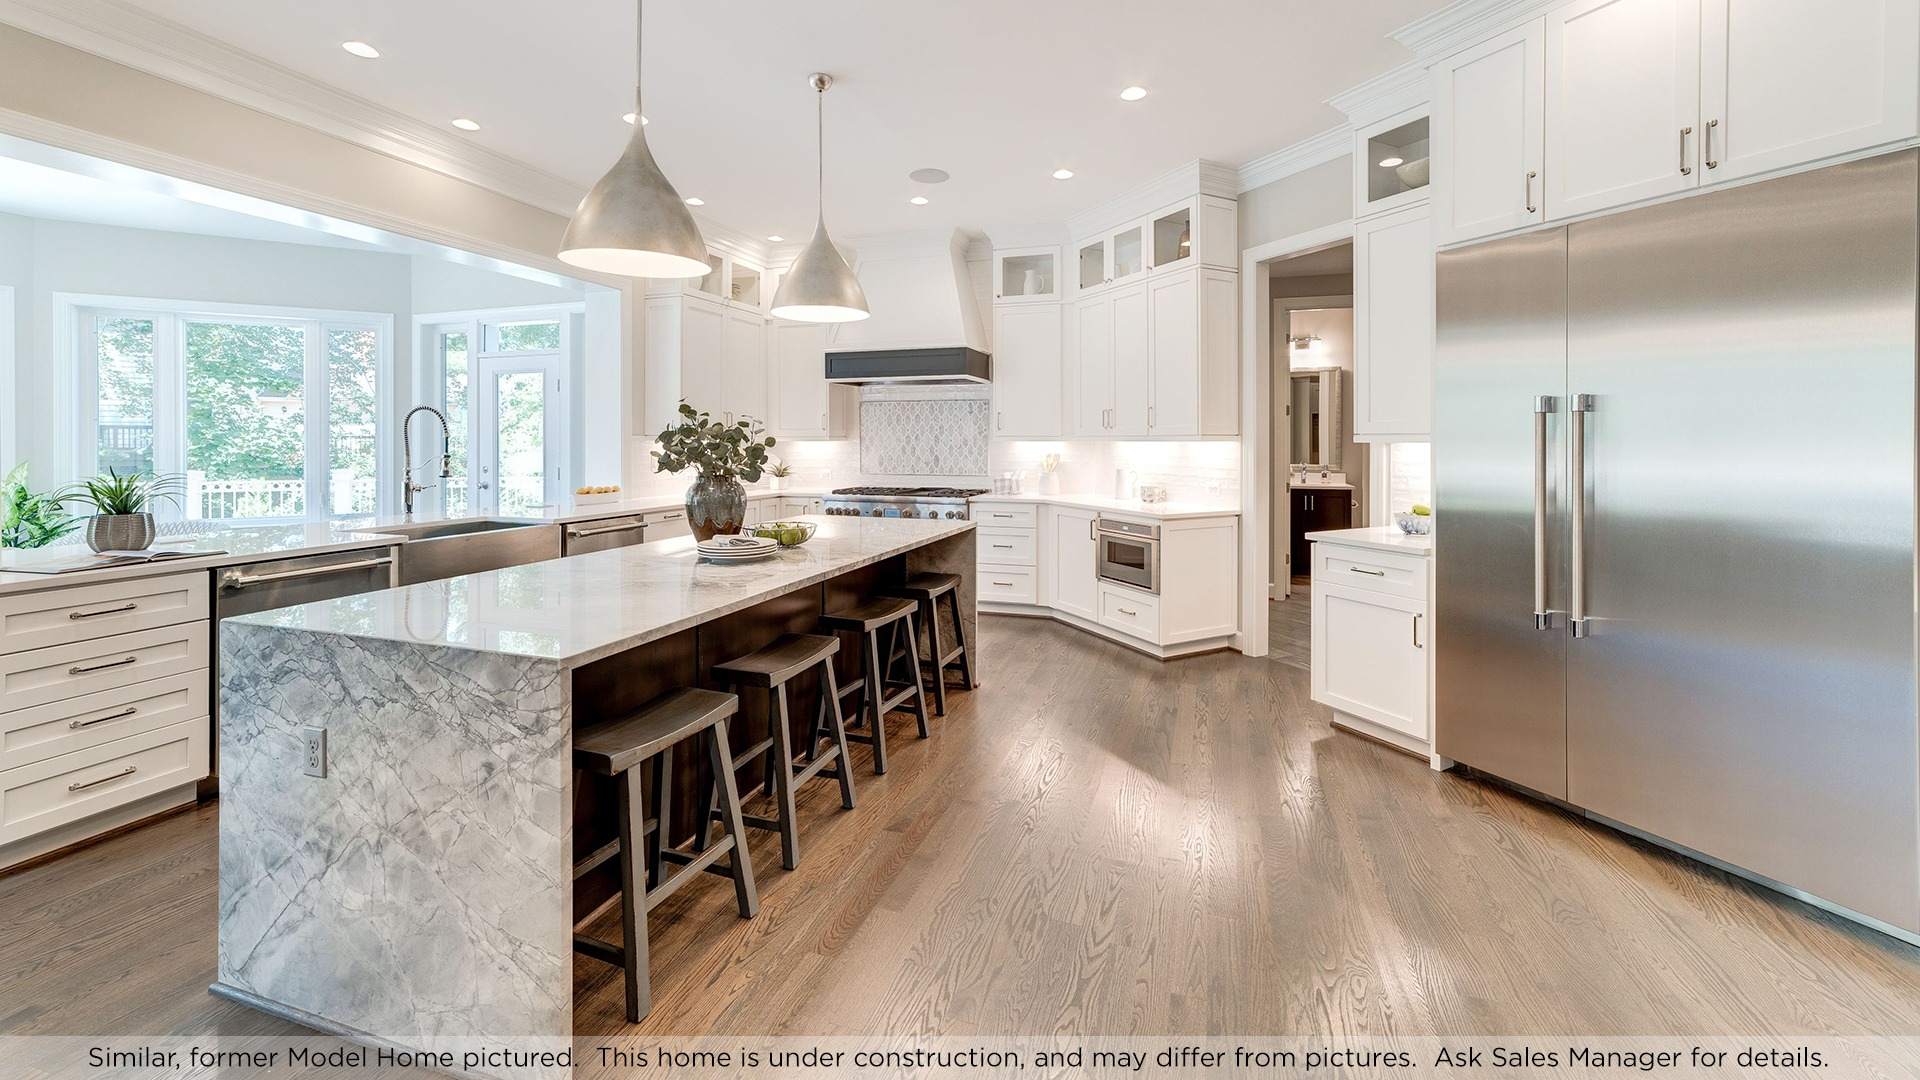 Kitchen, similar Model Home